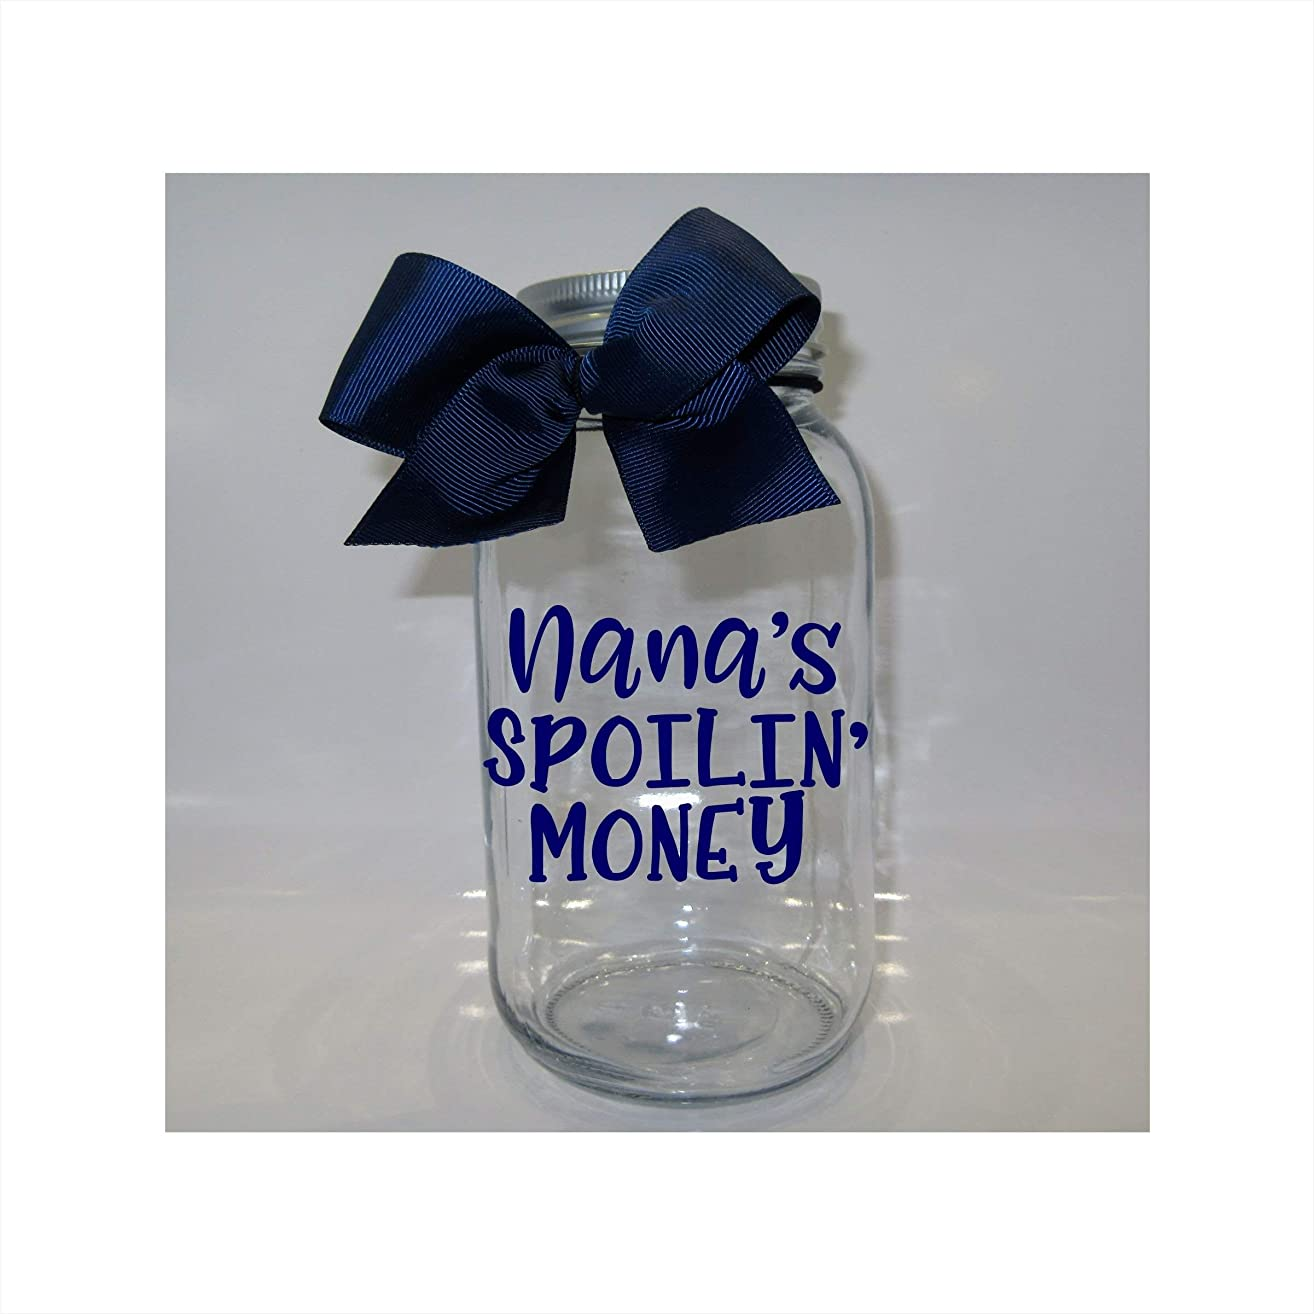 Nana's Spoilin' Money Mason Jar Bank - Coin Slot Lid - Available in 3 Sizes